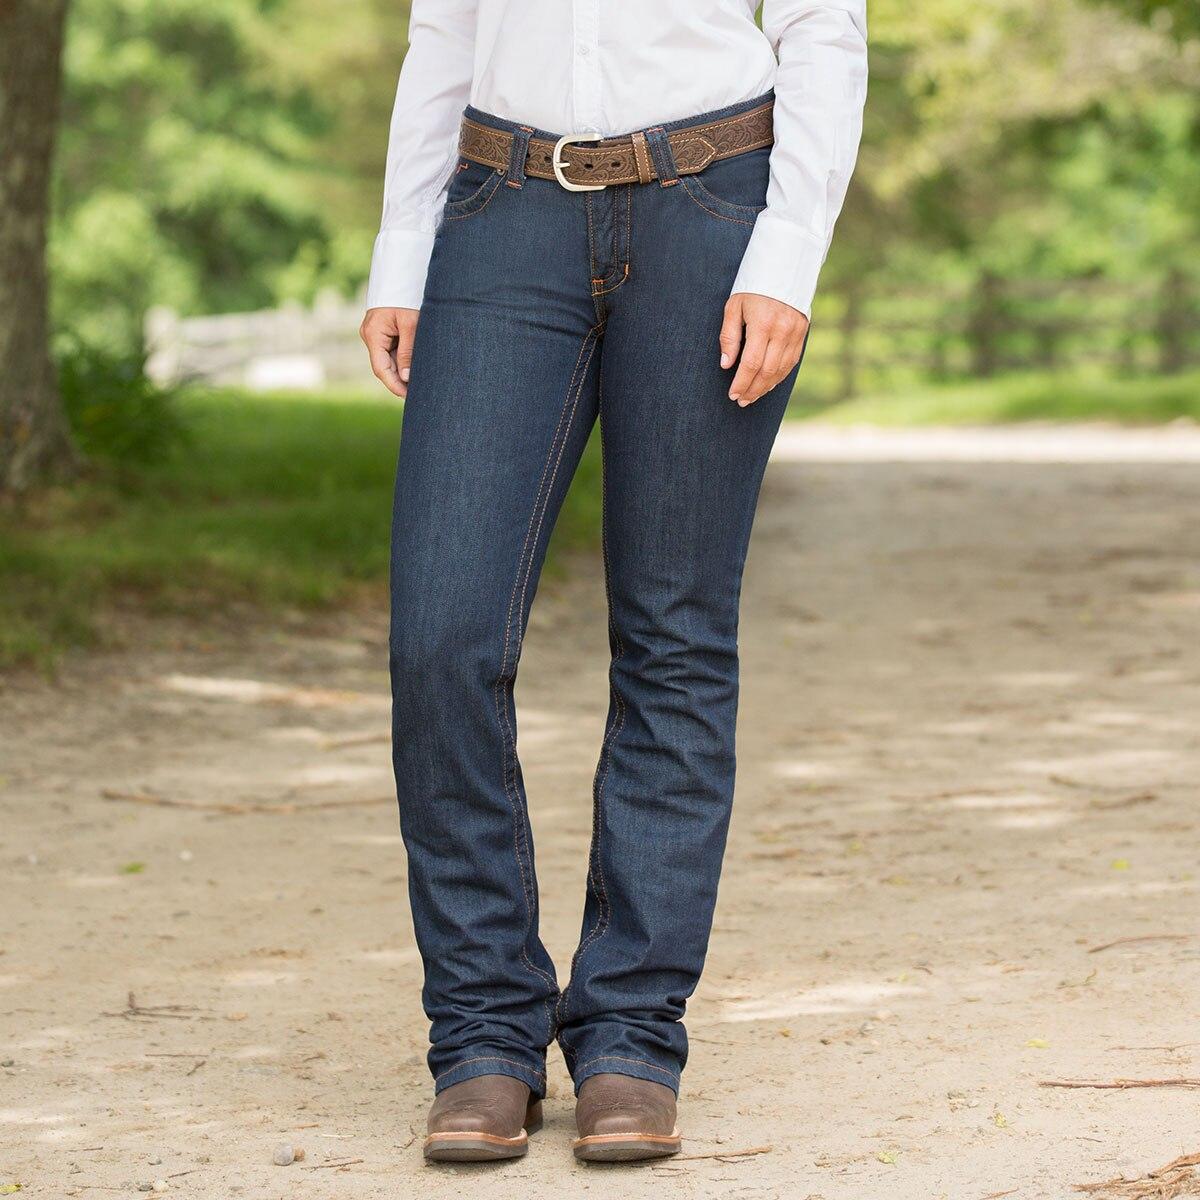 Kimes Ranch Women's Francesca Jeans